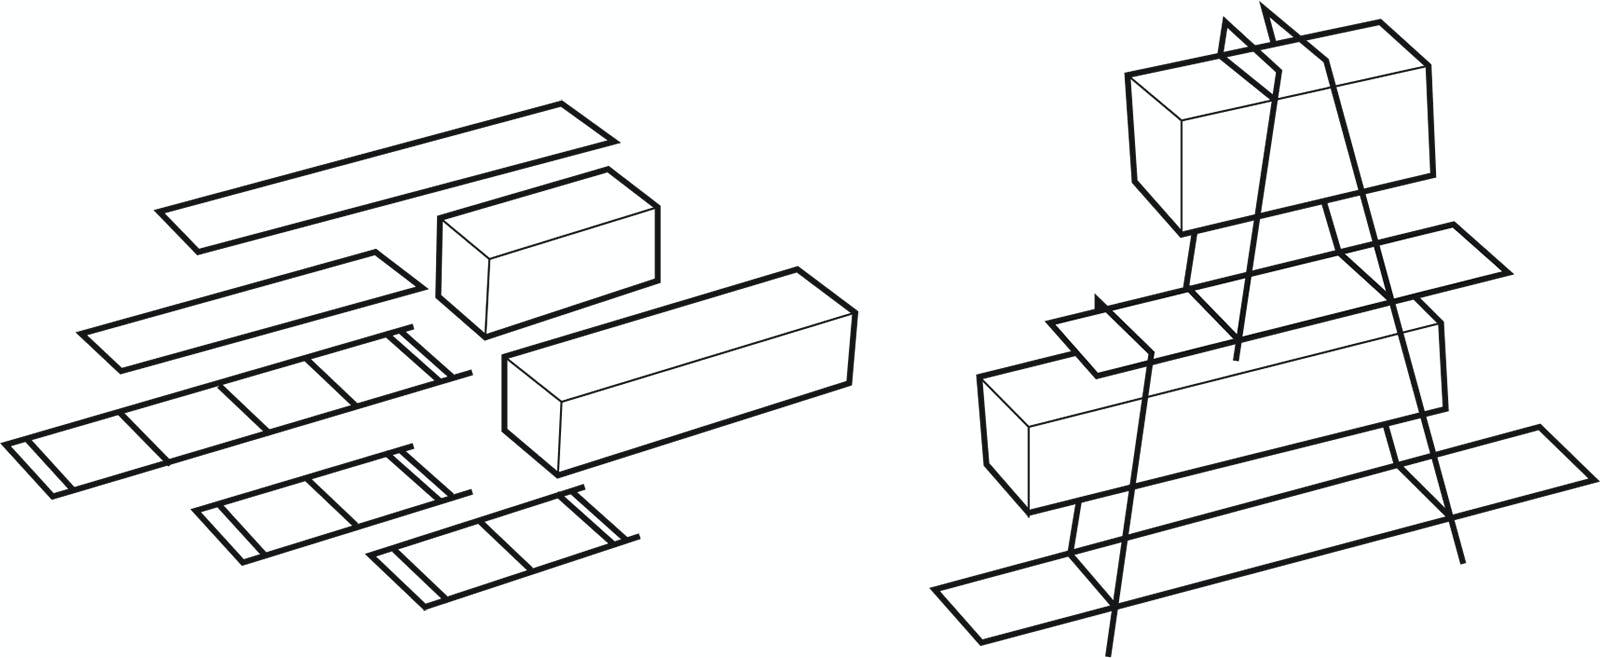 33e4366f 1c20 482f 9197 2e62f73f5b1c%2fbryanmaddock compressiontest furniture